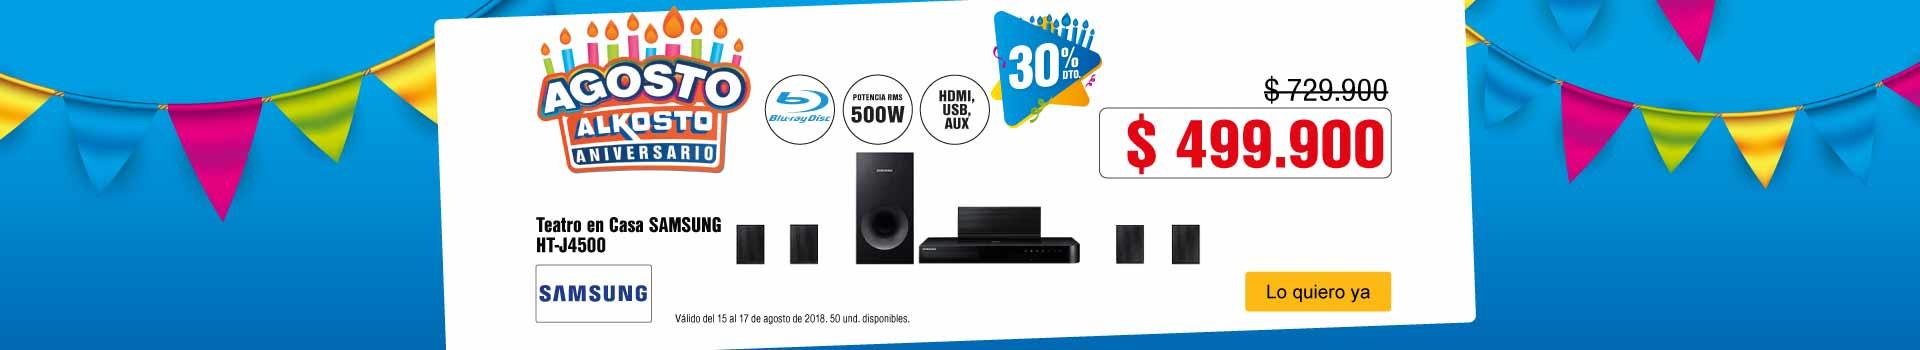 AK-BCAT-2-audio-PP---Samsung-ht-j4500-Ago15